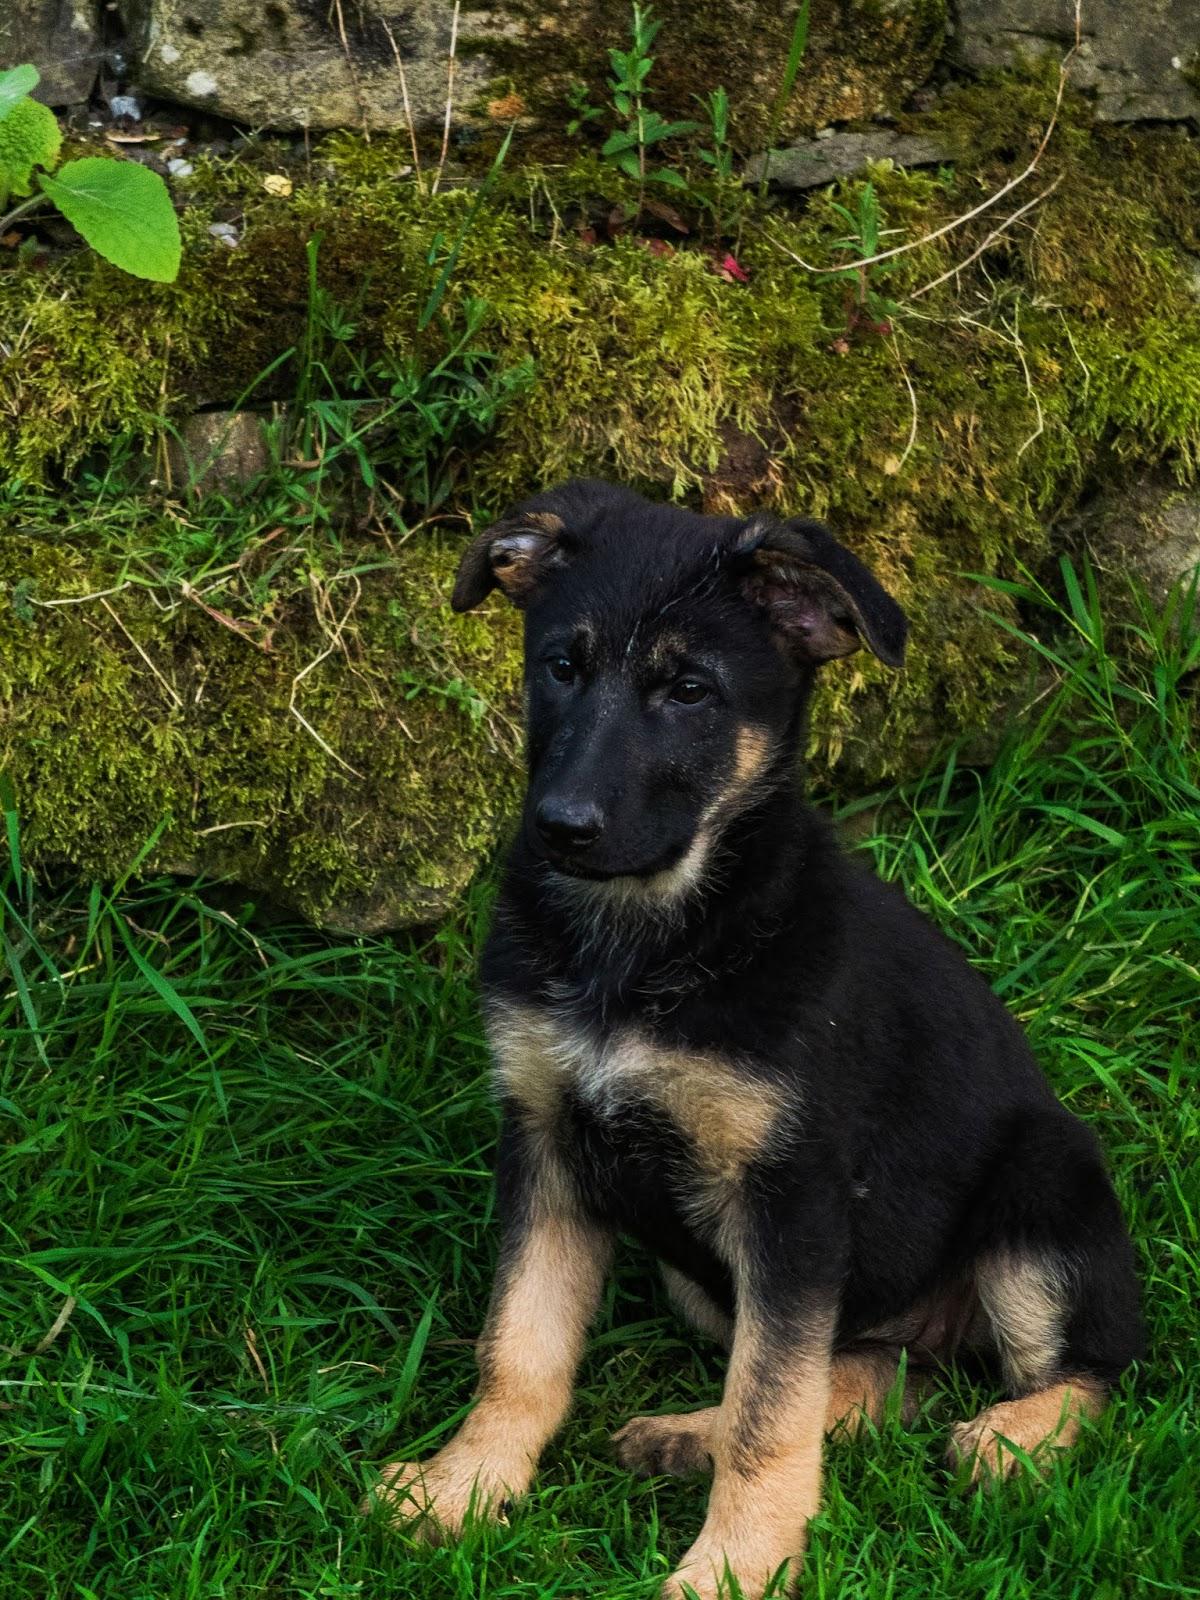 11 week old German Shepherd puppy sitting in the grass.